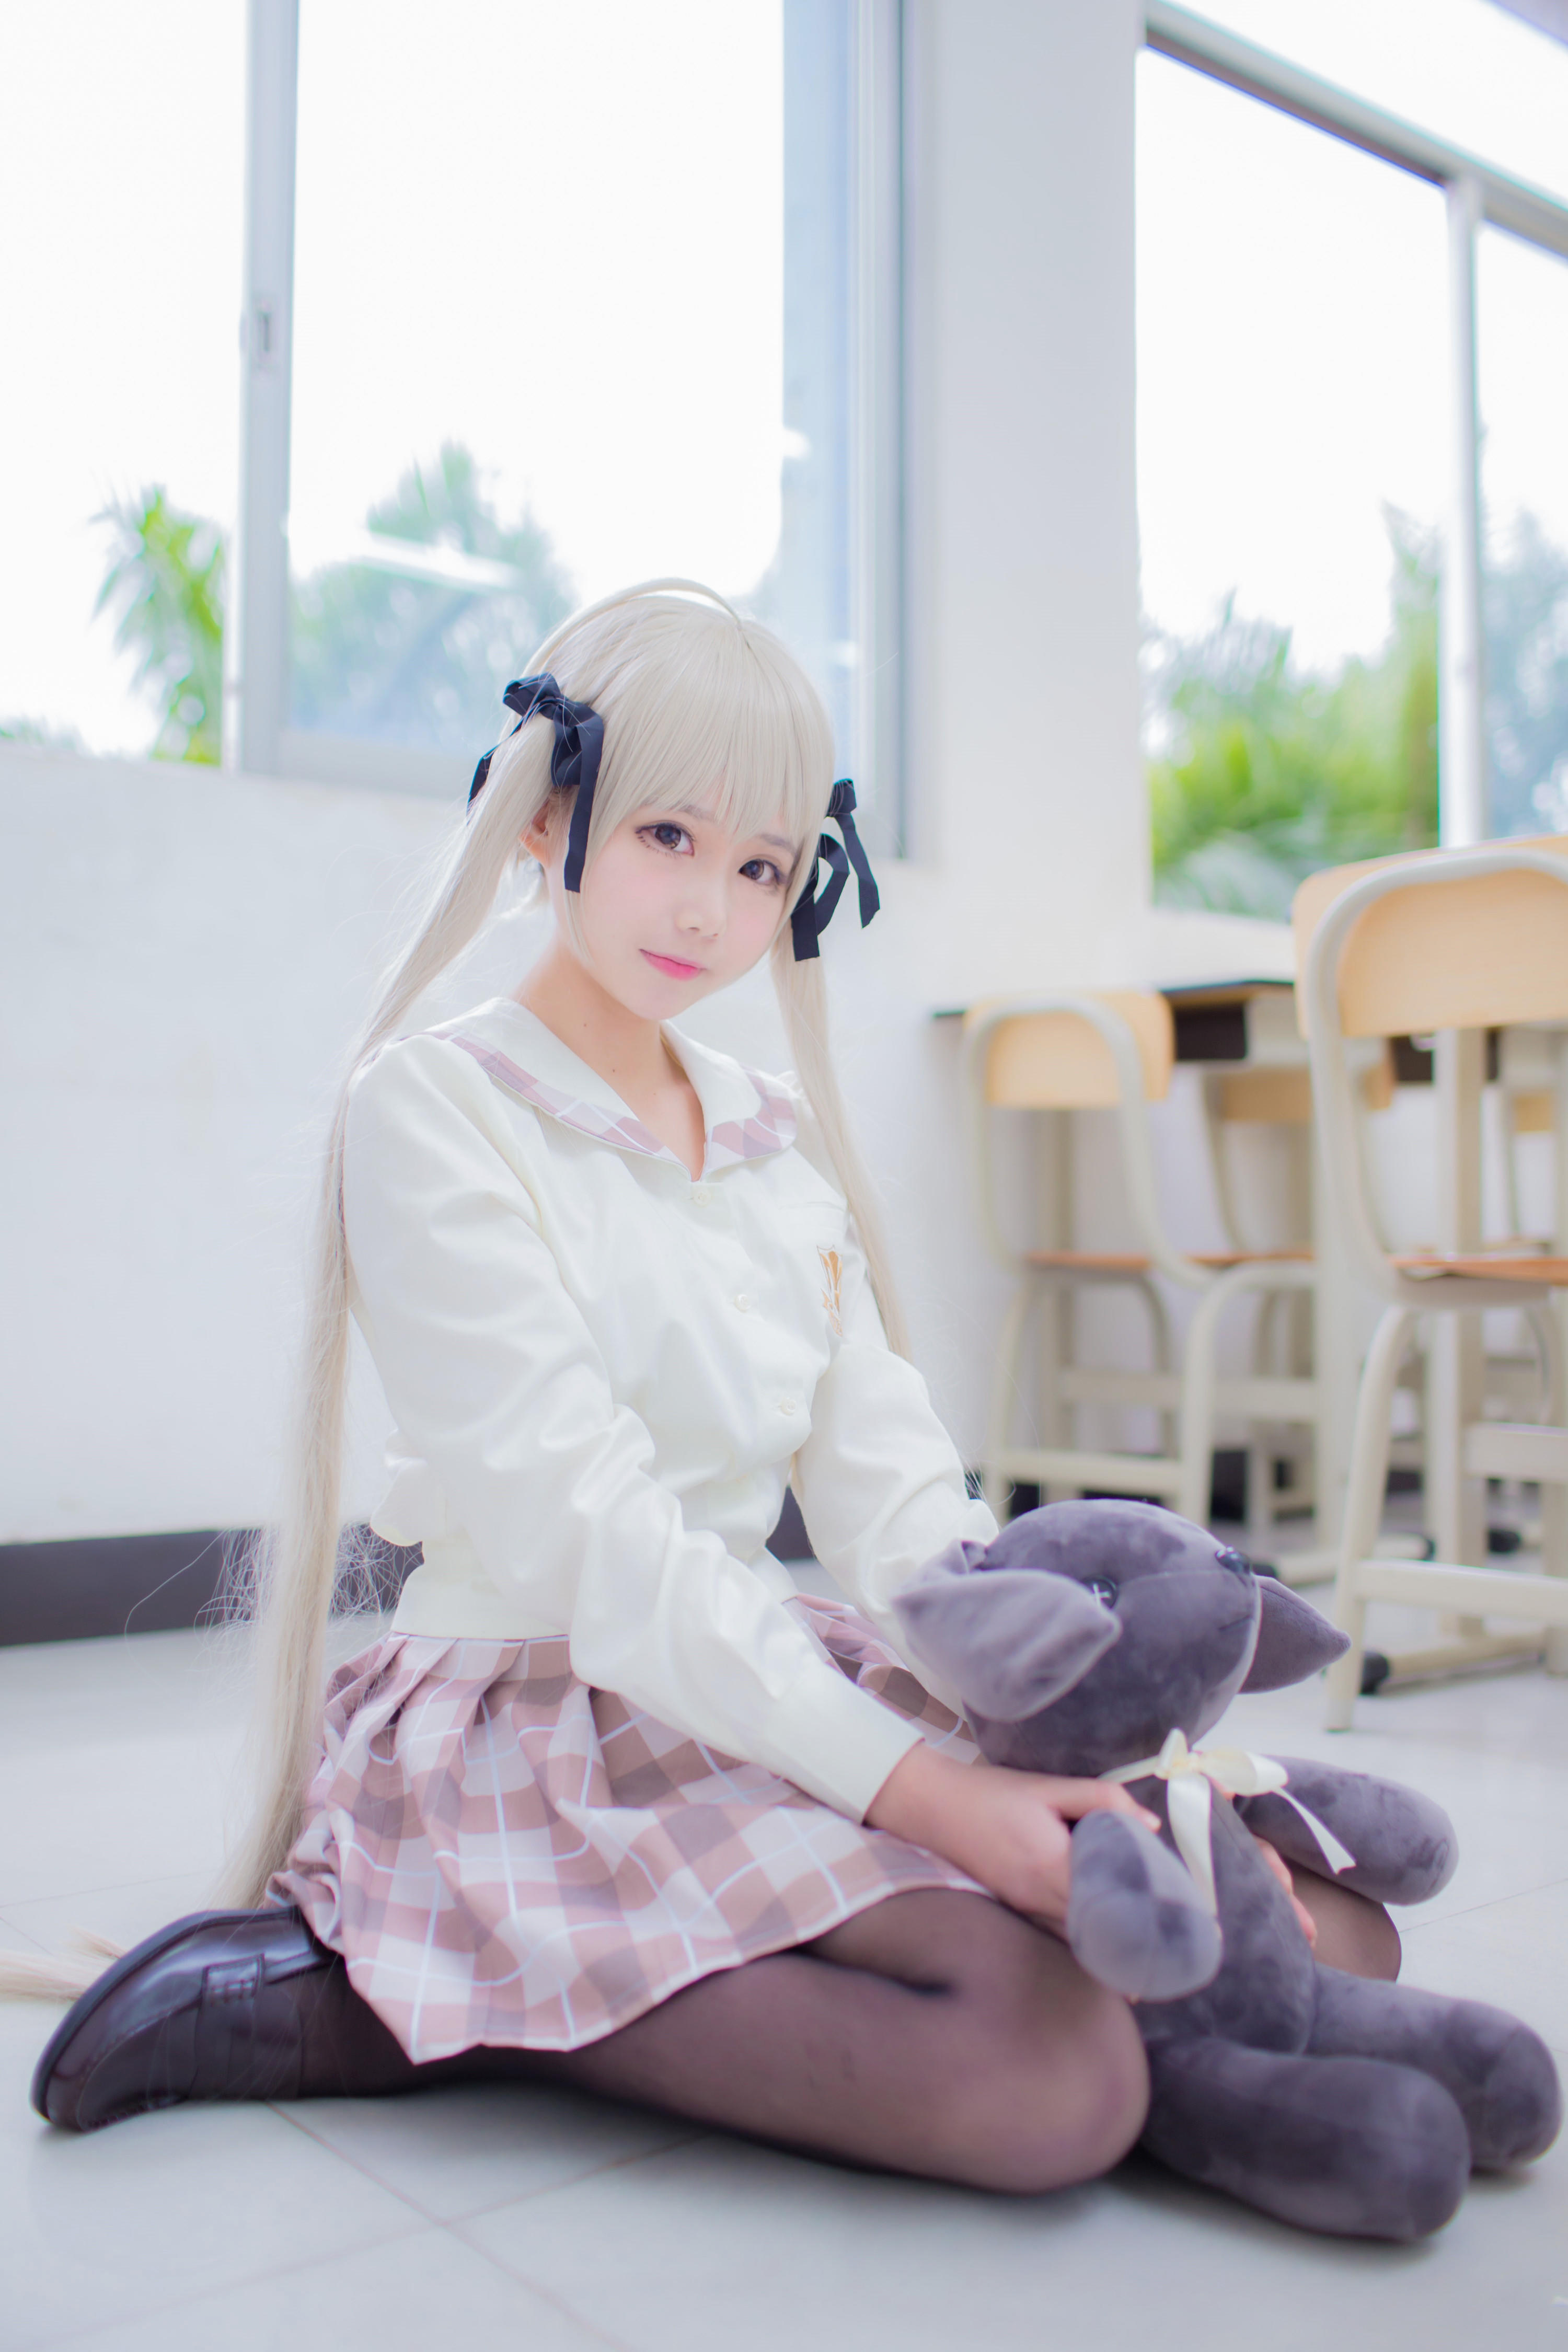 【Cosplay】缘之空 双马尾-小柚妹站